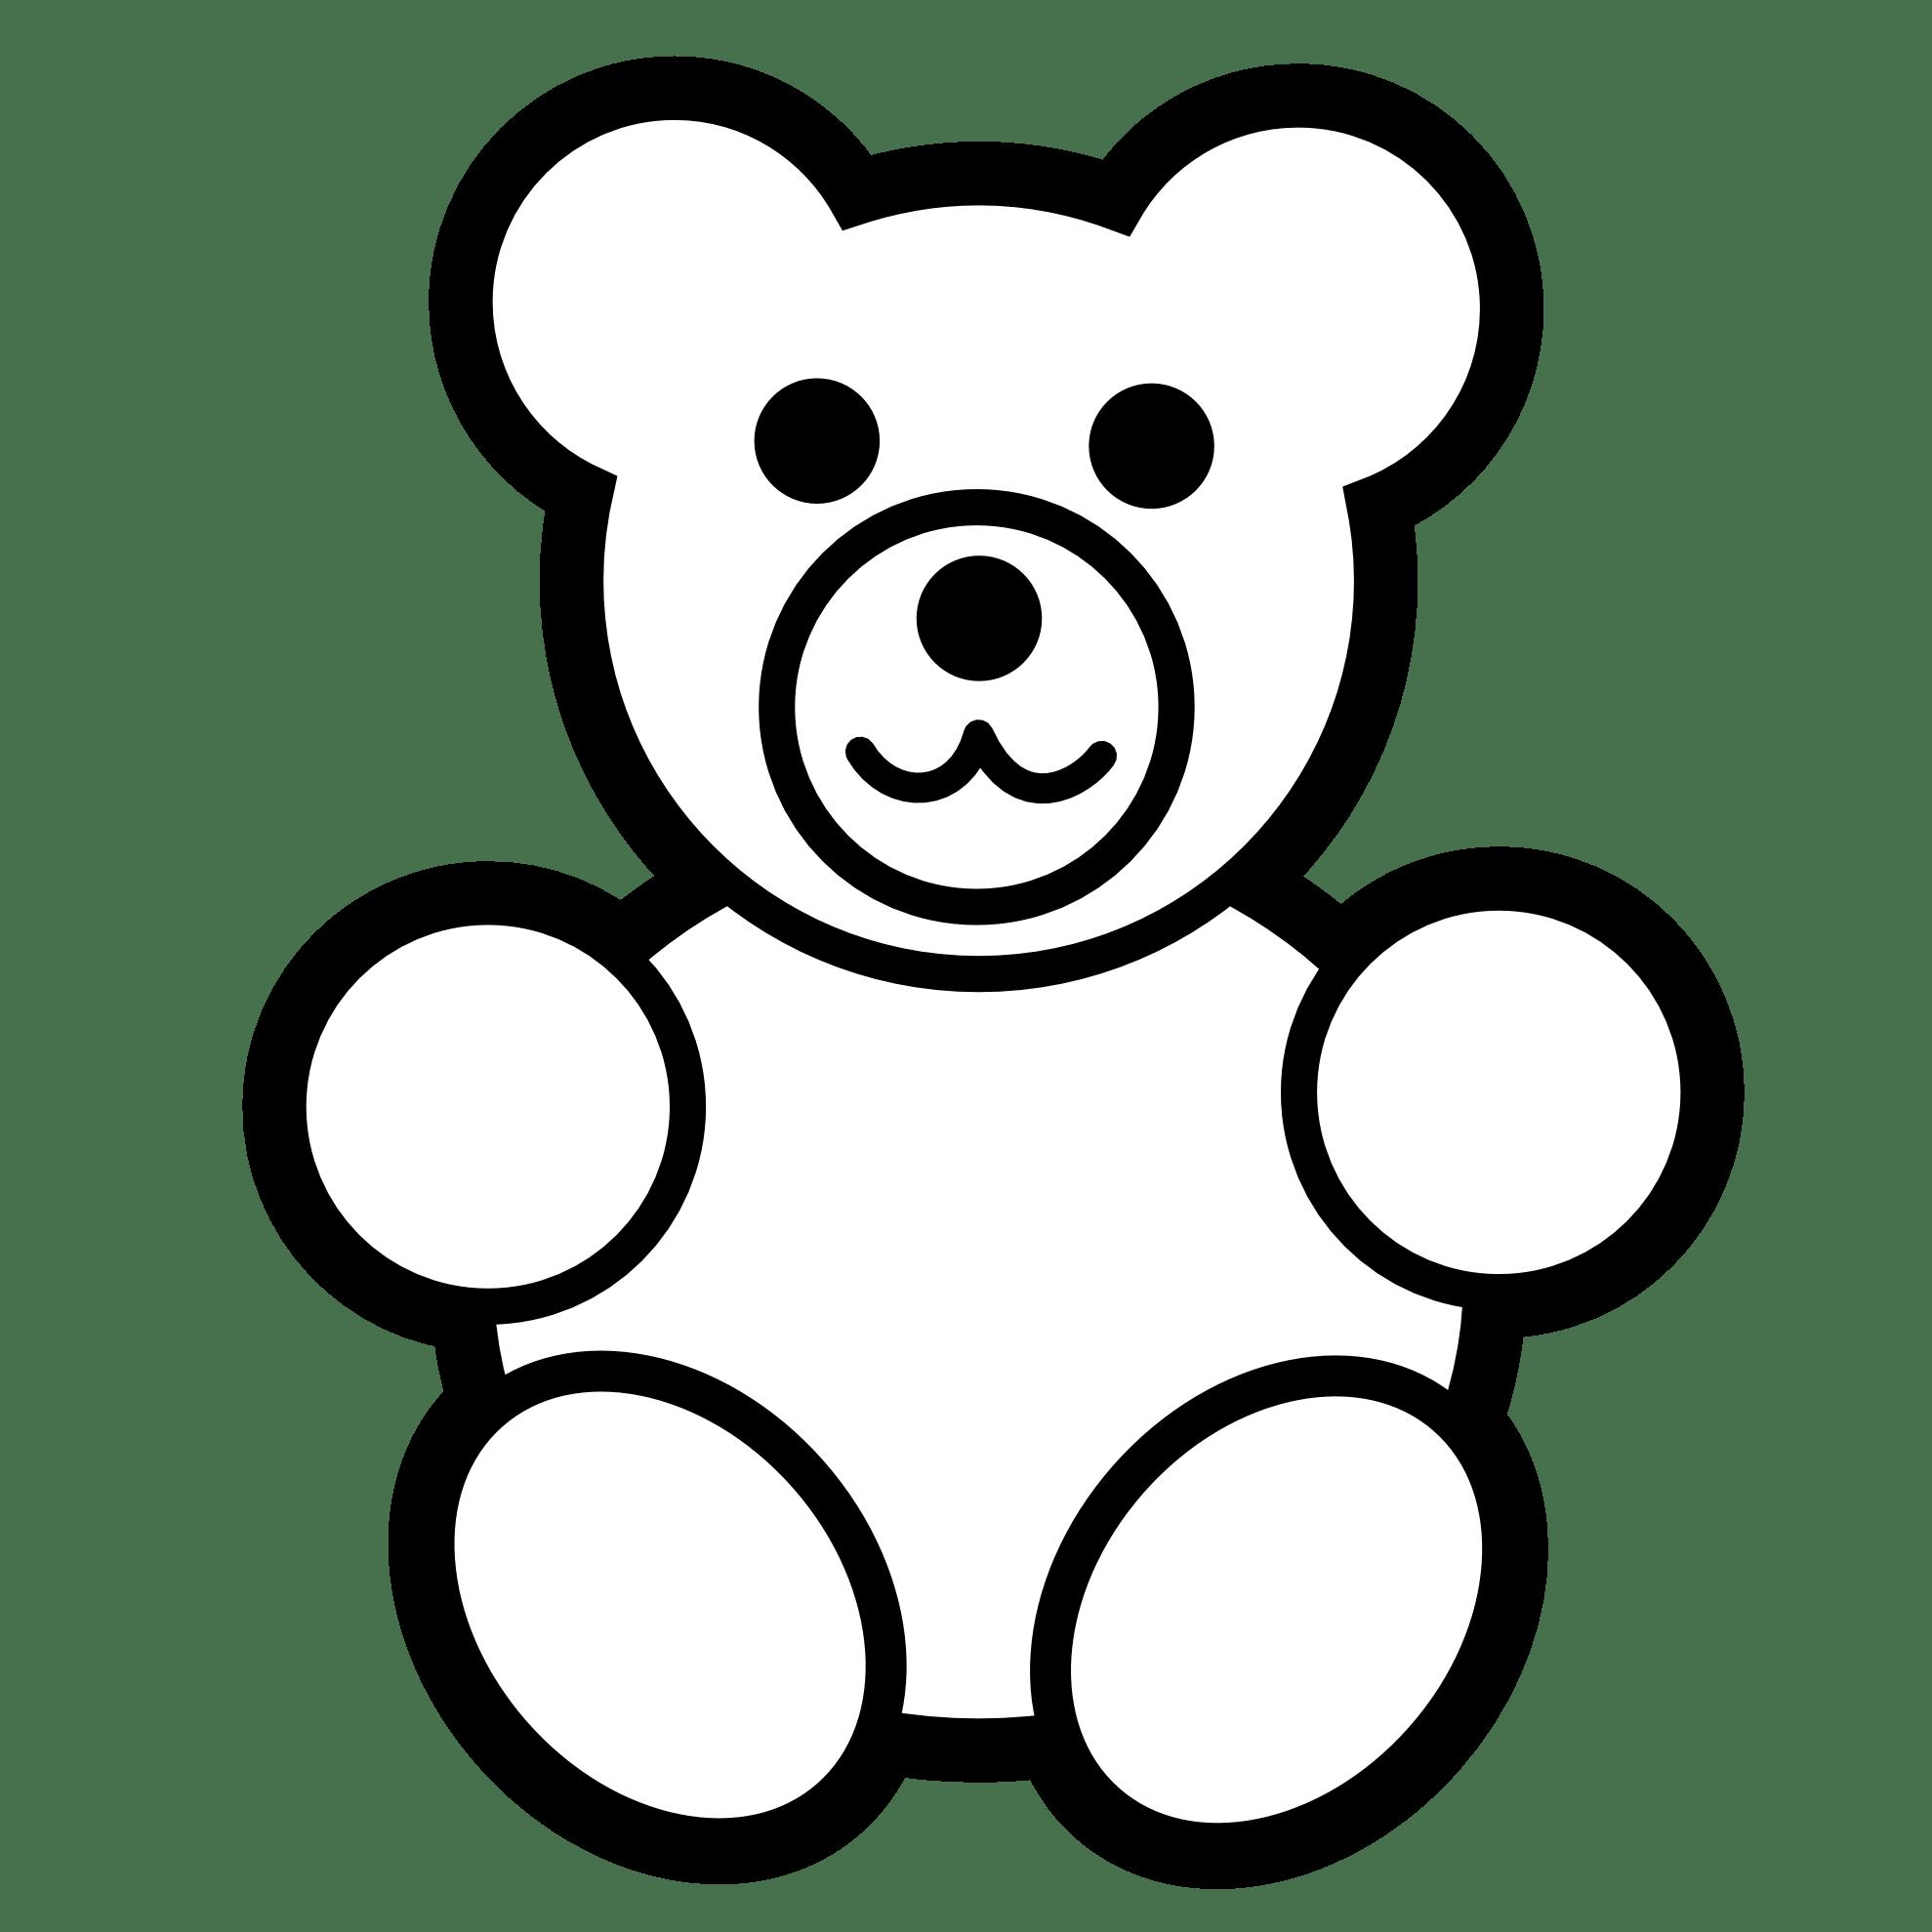 Stuffed Animal Cartoon